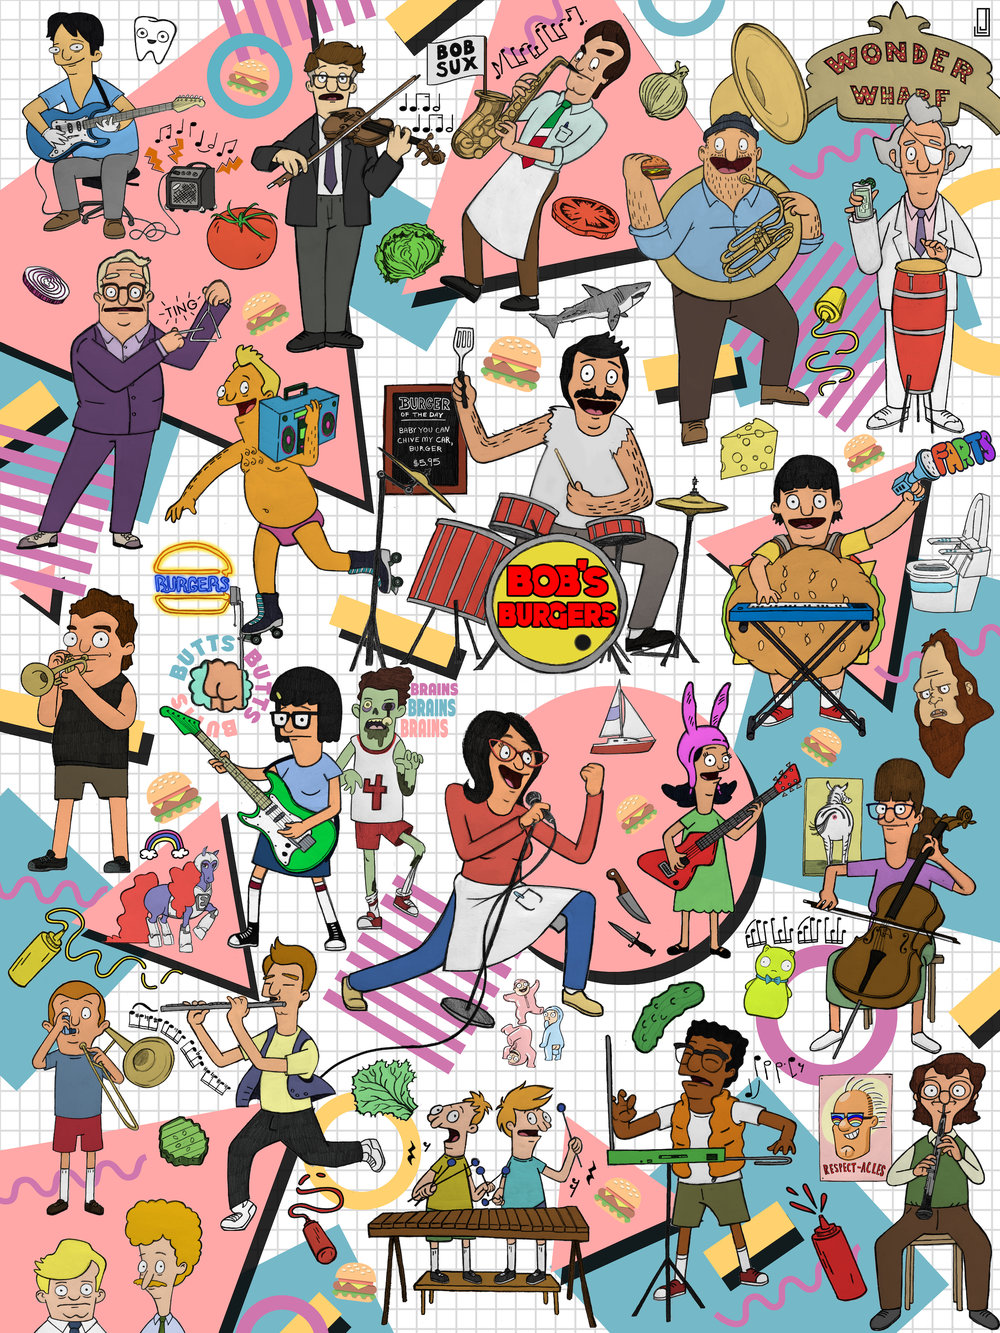 Bob's Burgers - Making Music